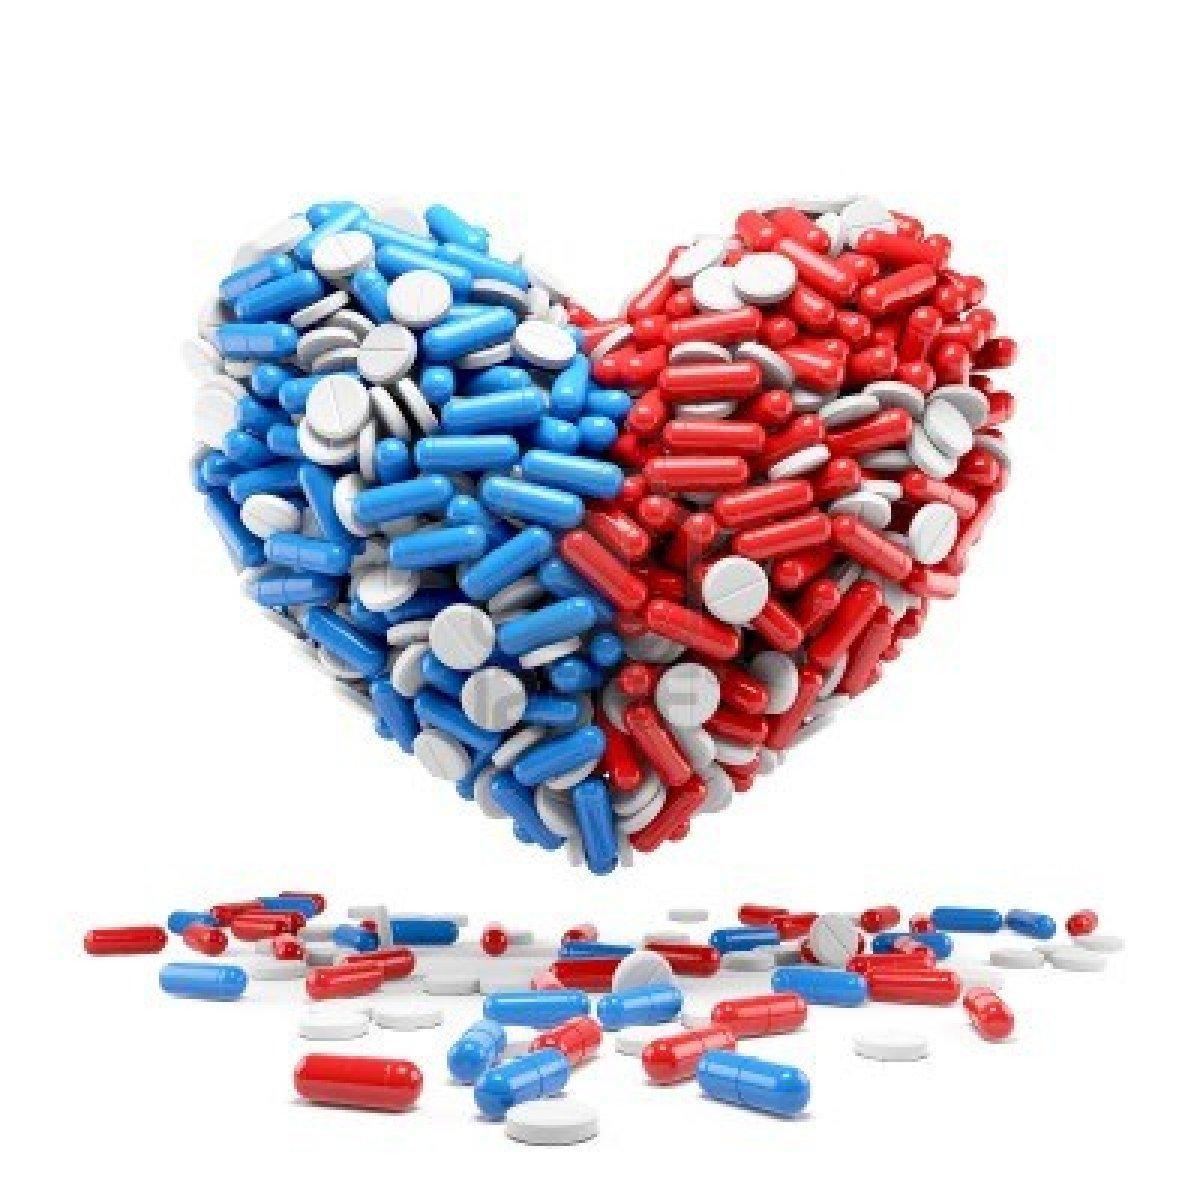 alpha pharma healthcare oxandrolone